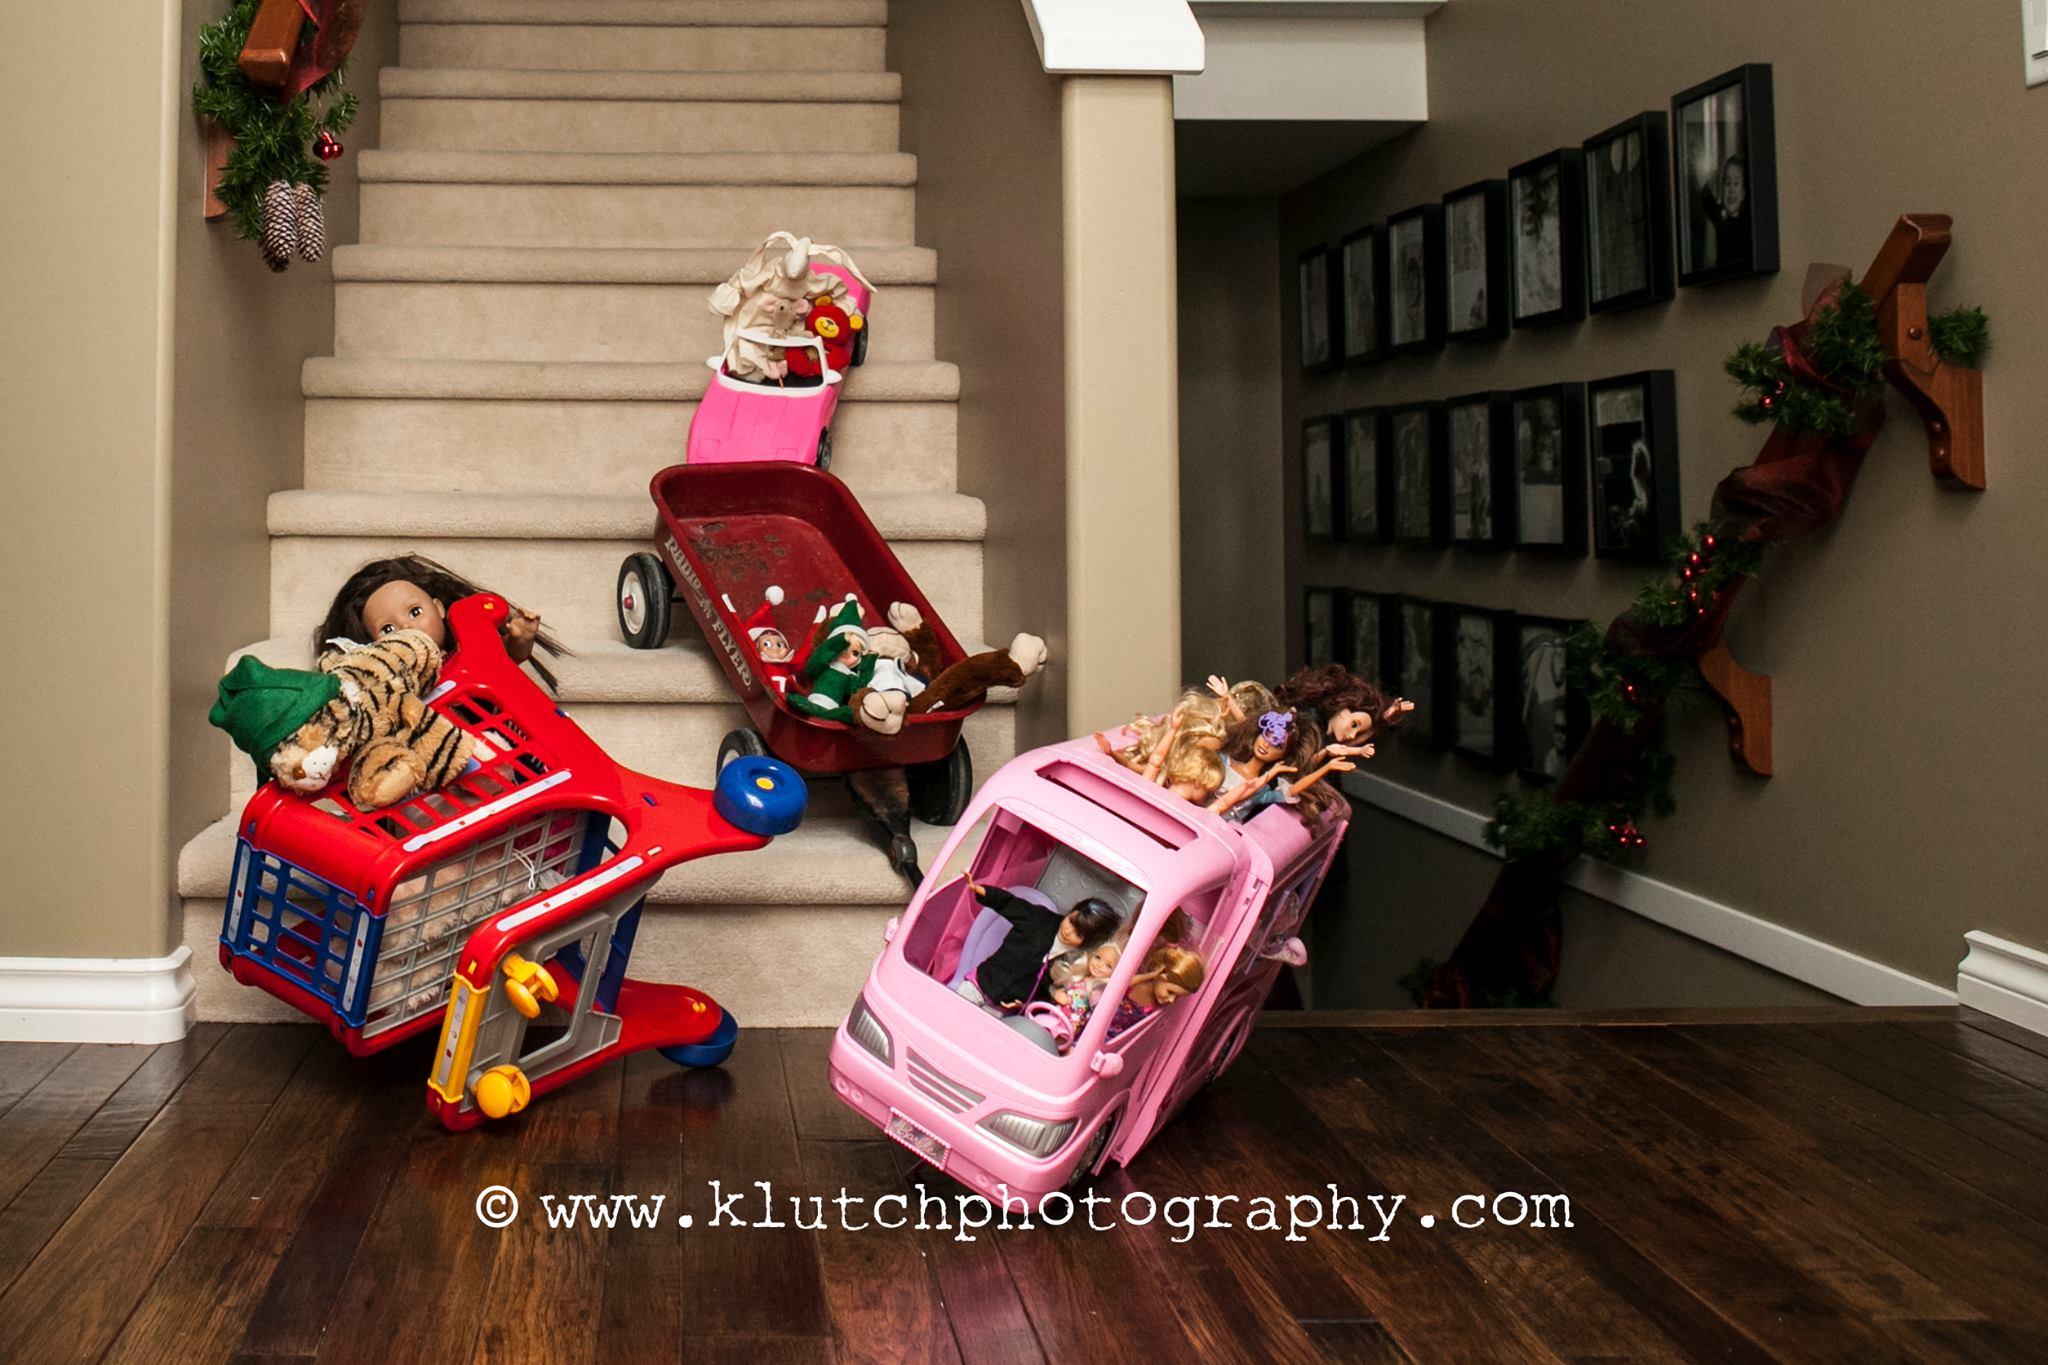 Klutch Photography, family photographer, elf on the shelf, vancouver family photographer, whiterock family photographer, lifeunscripted photographer, lifestlye photographer f.jpg